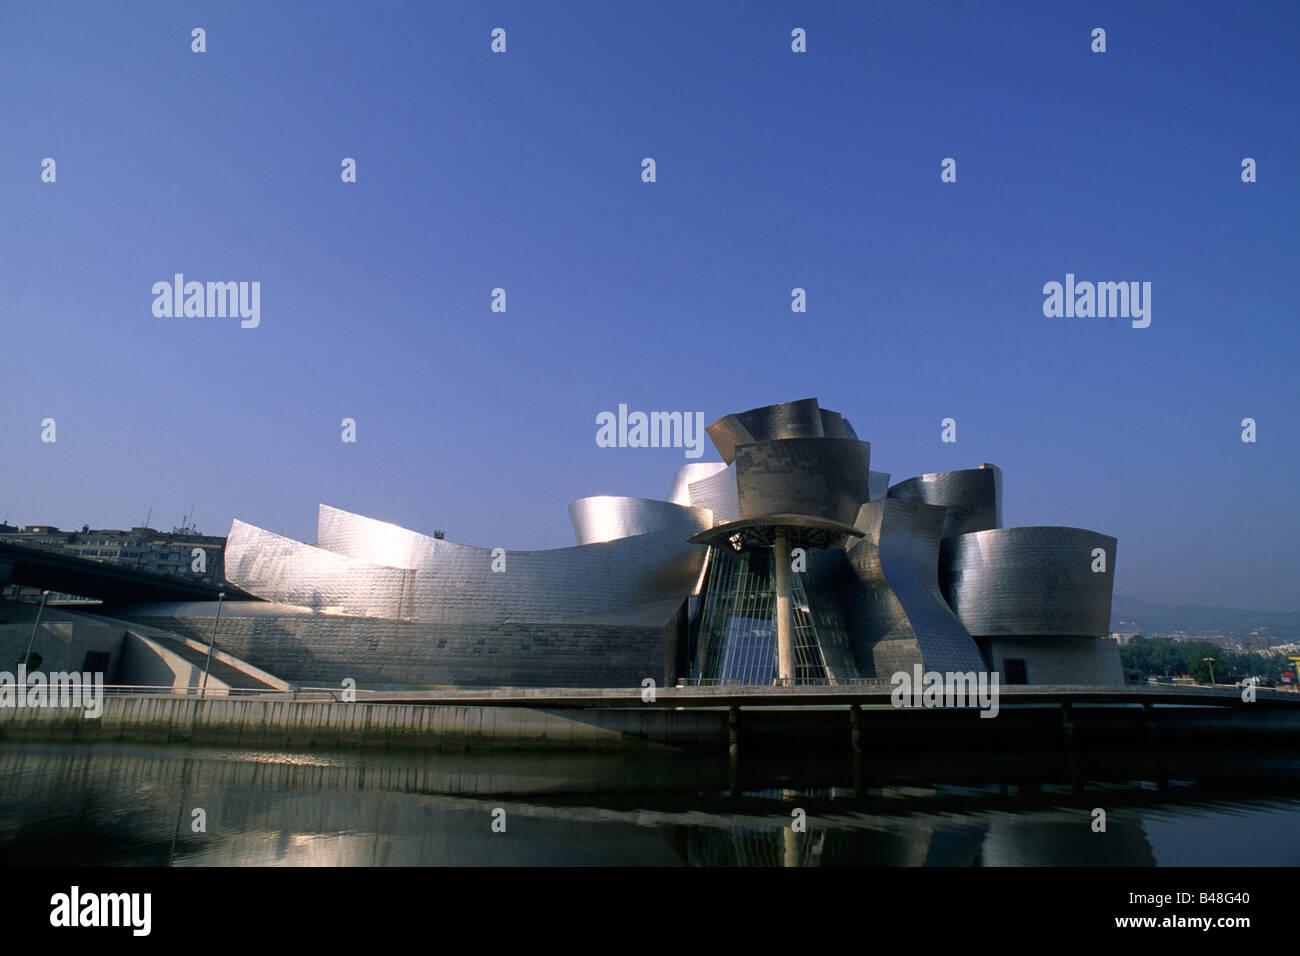 spain, bilbao, guggenheim museum, architect frank gehry - Stock Image